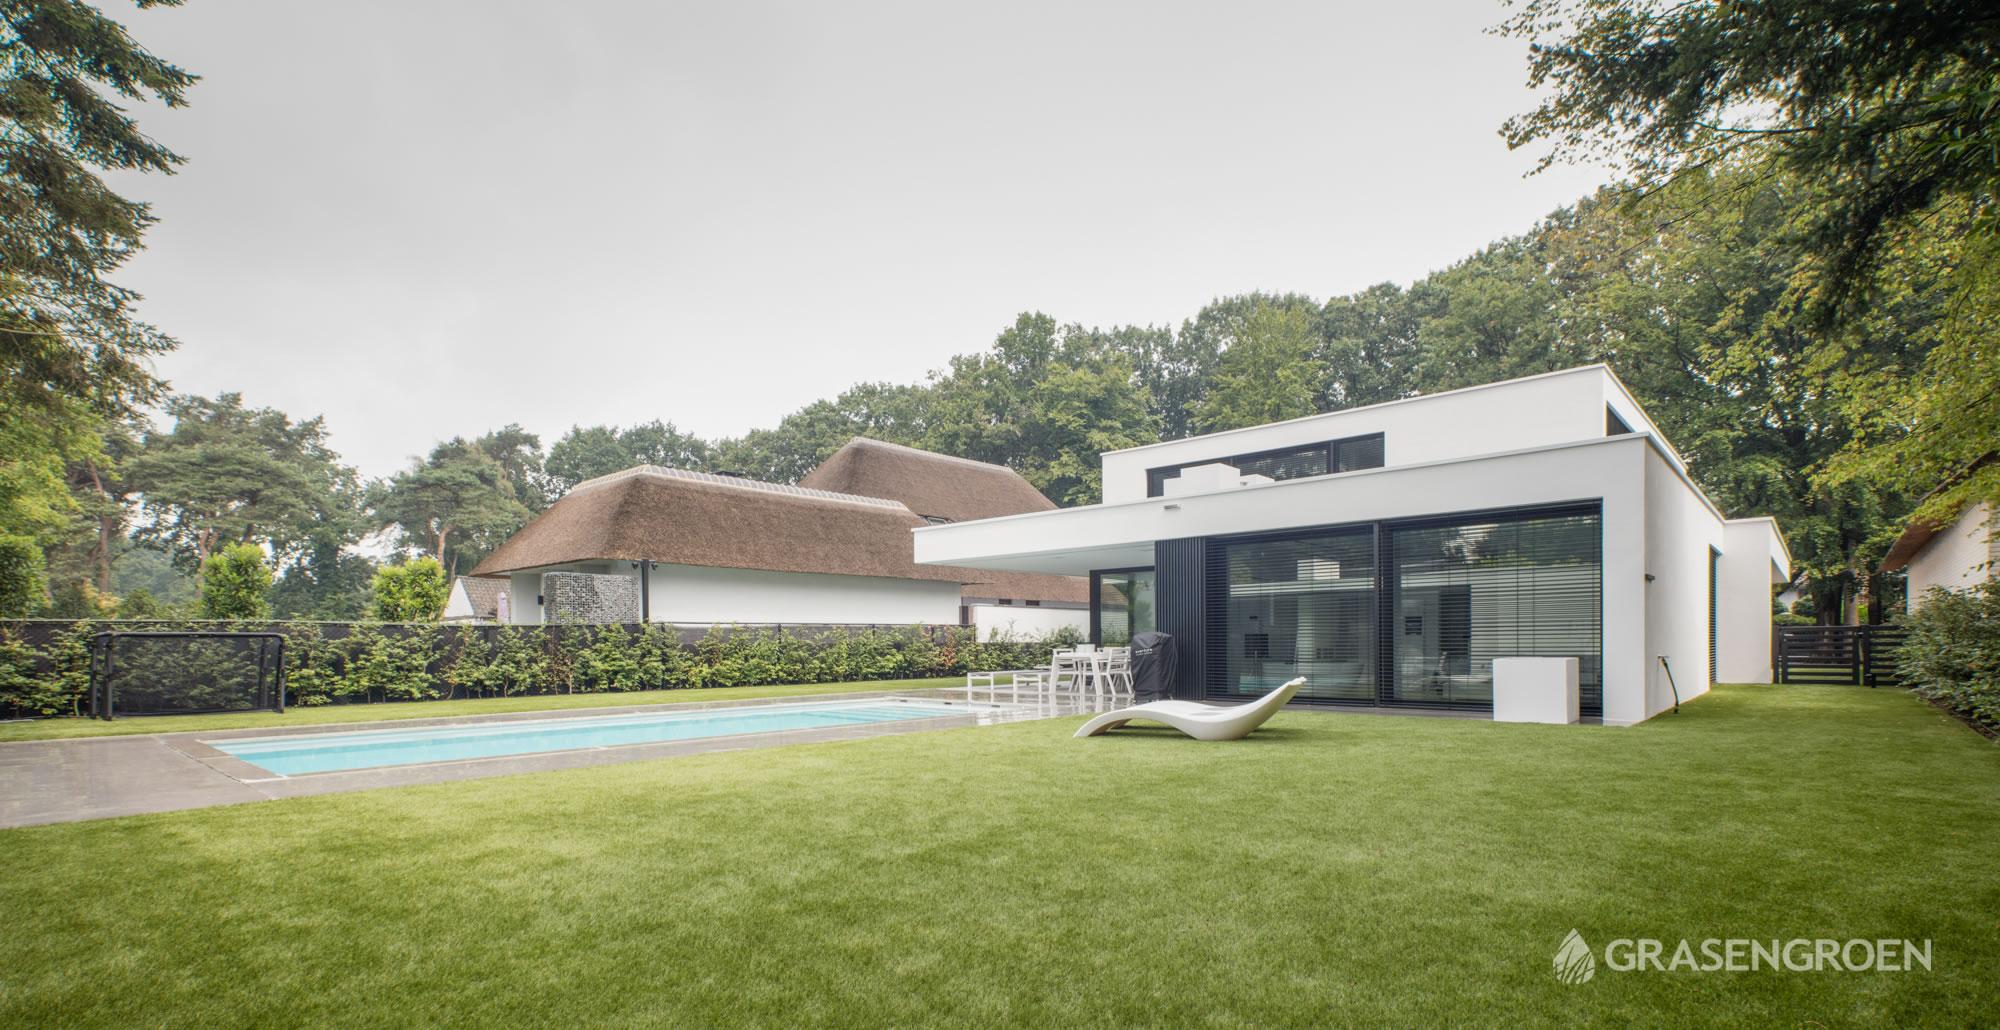 Kunstgrasleggenturnhout17 • Gras en Groen Kunstgras